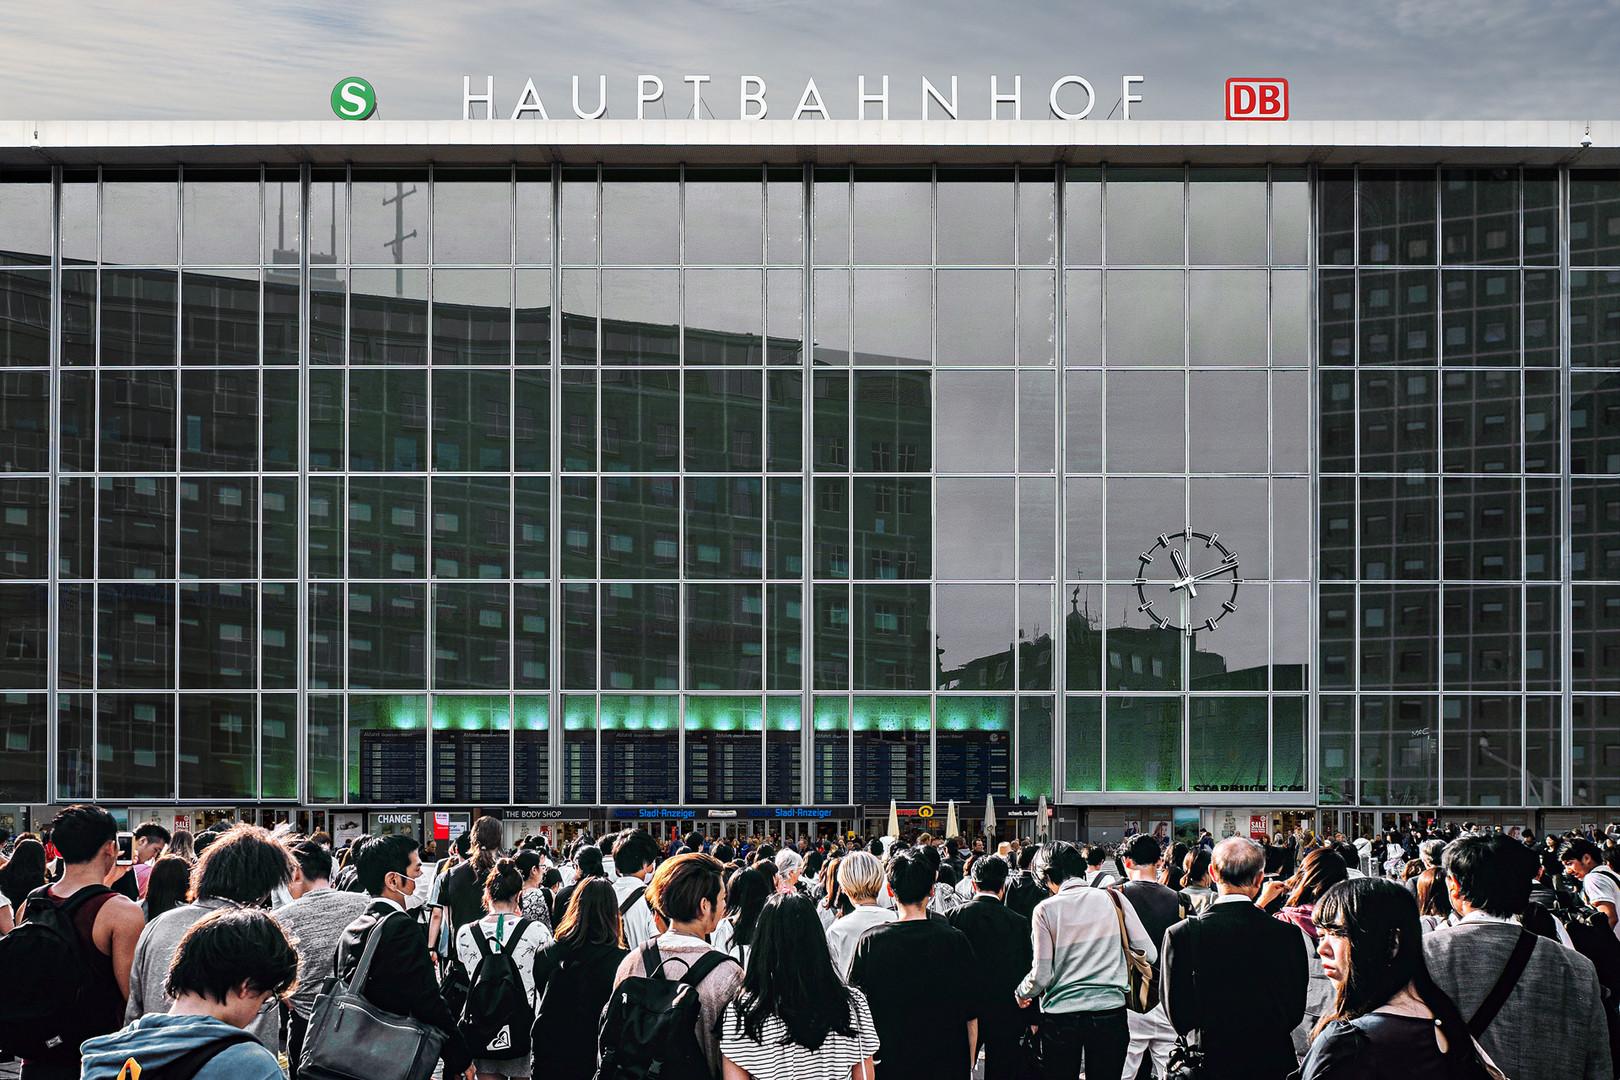 Cologne Main Station 11.11am